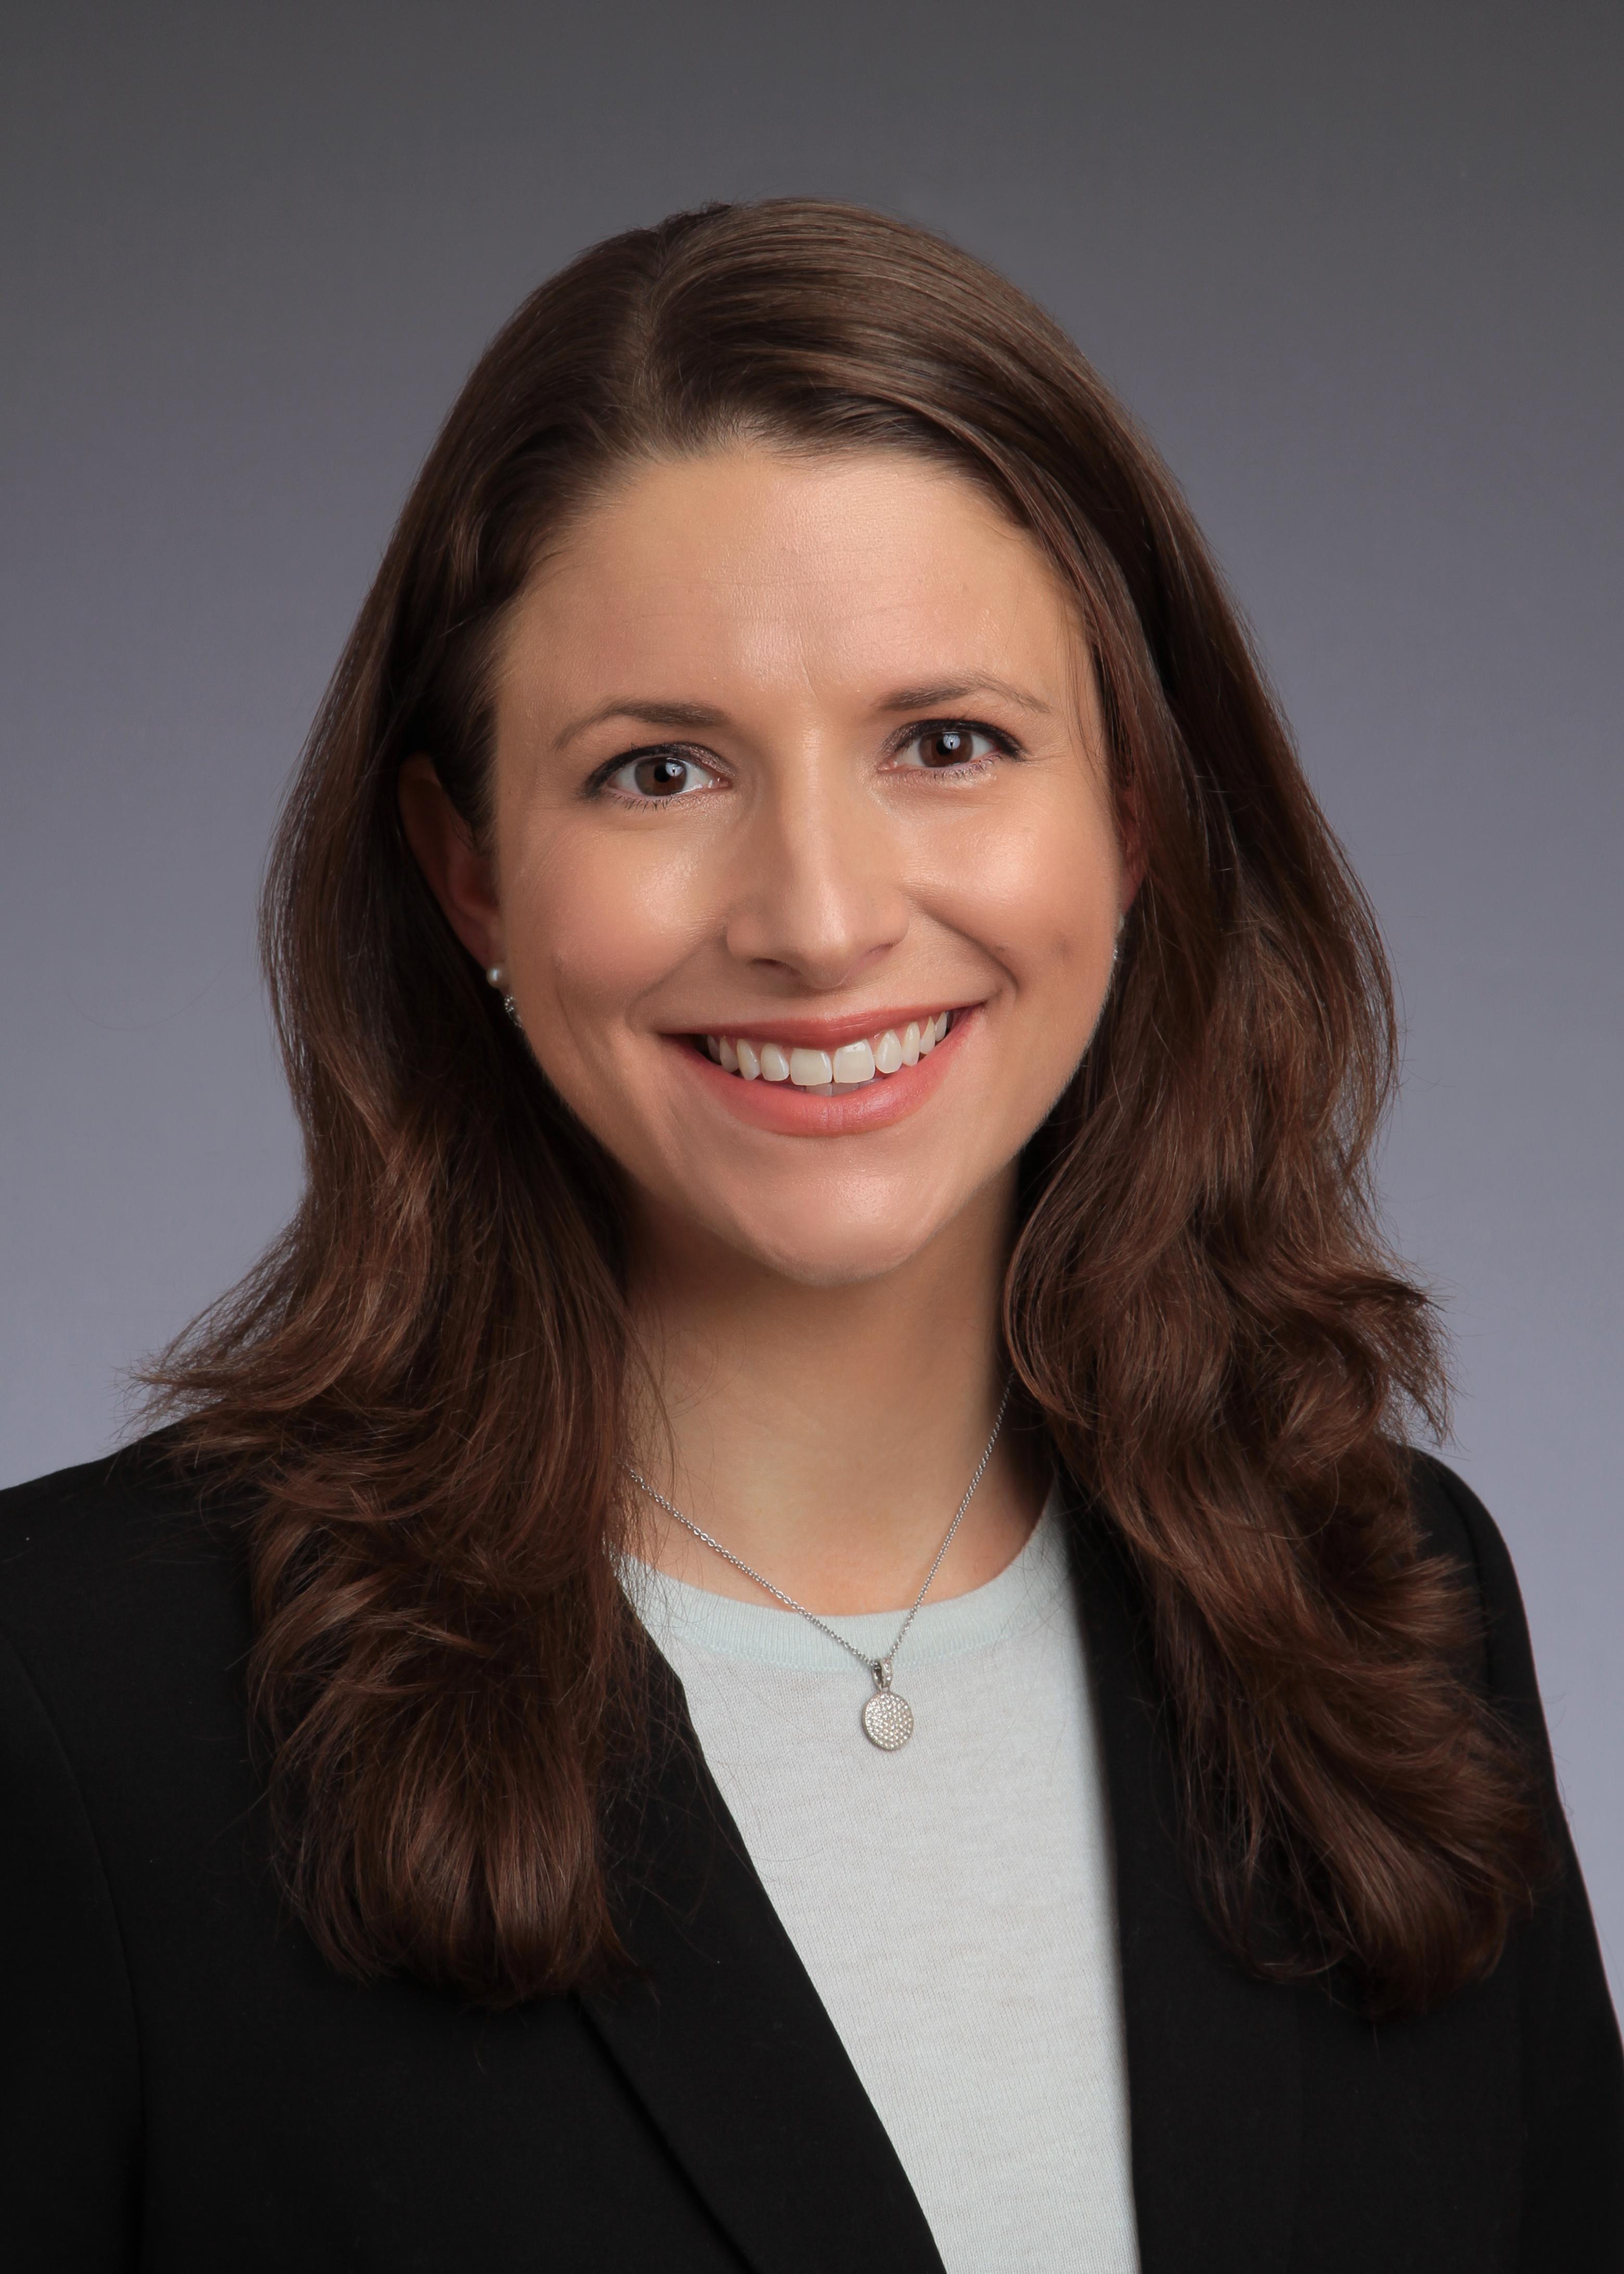 Brianna McDonald - Director of Operations